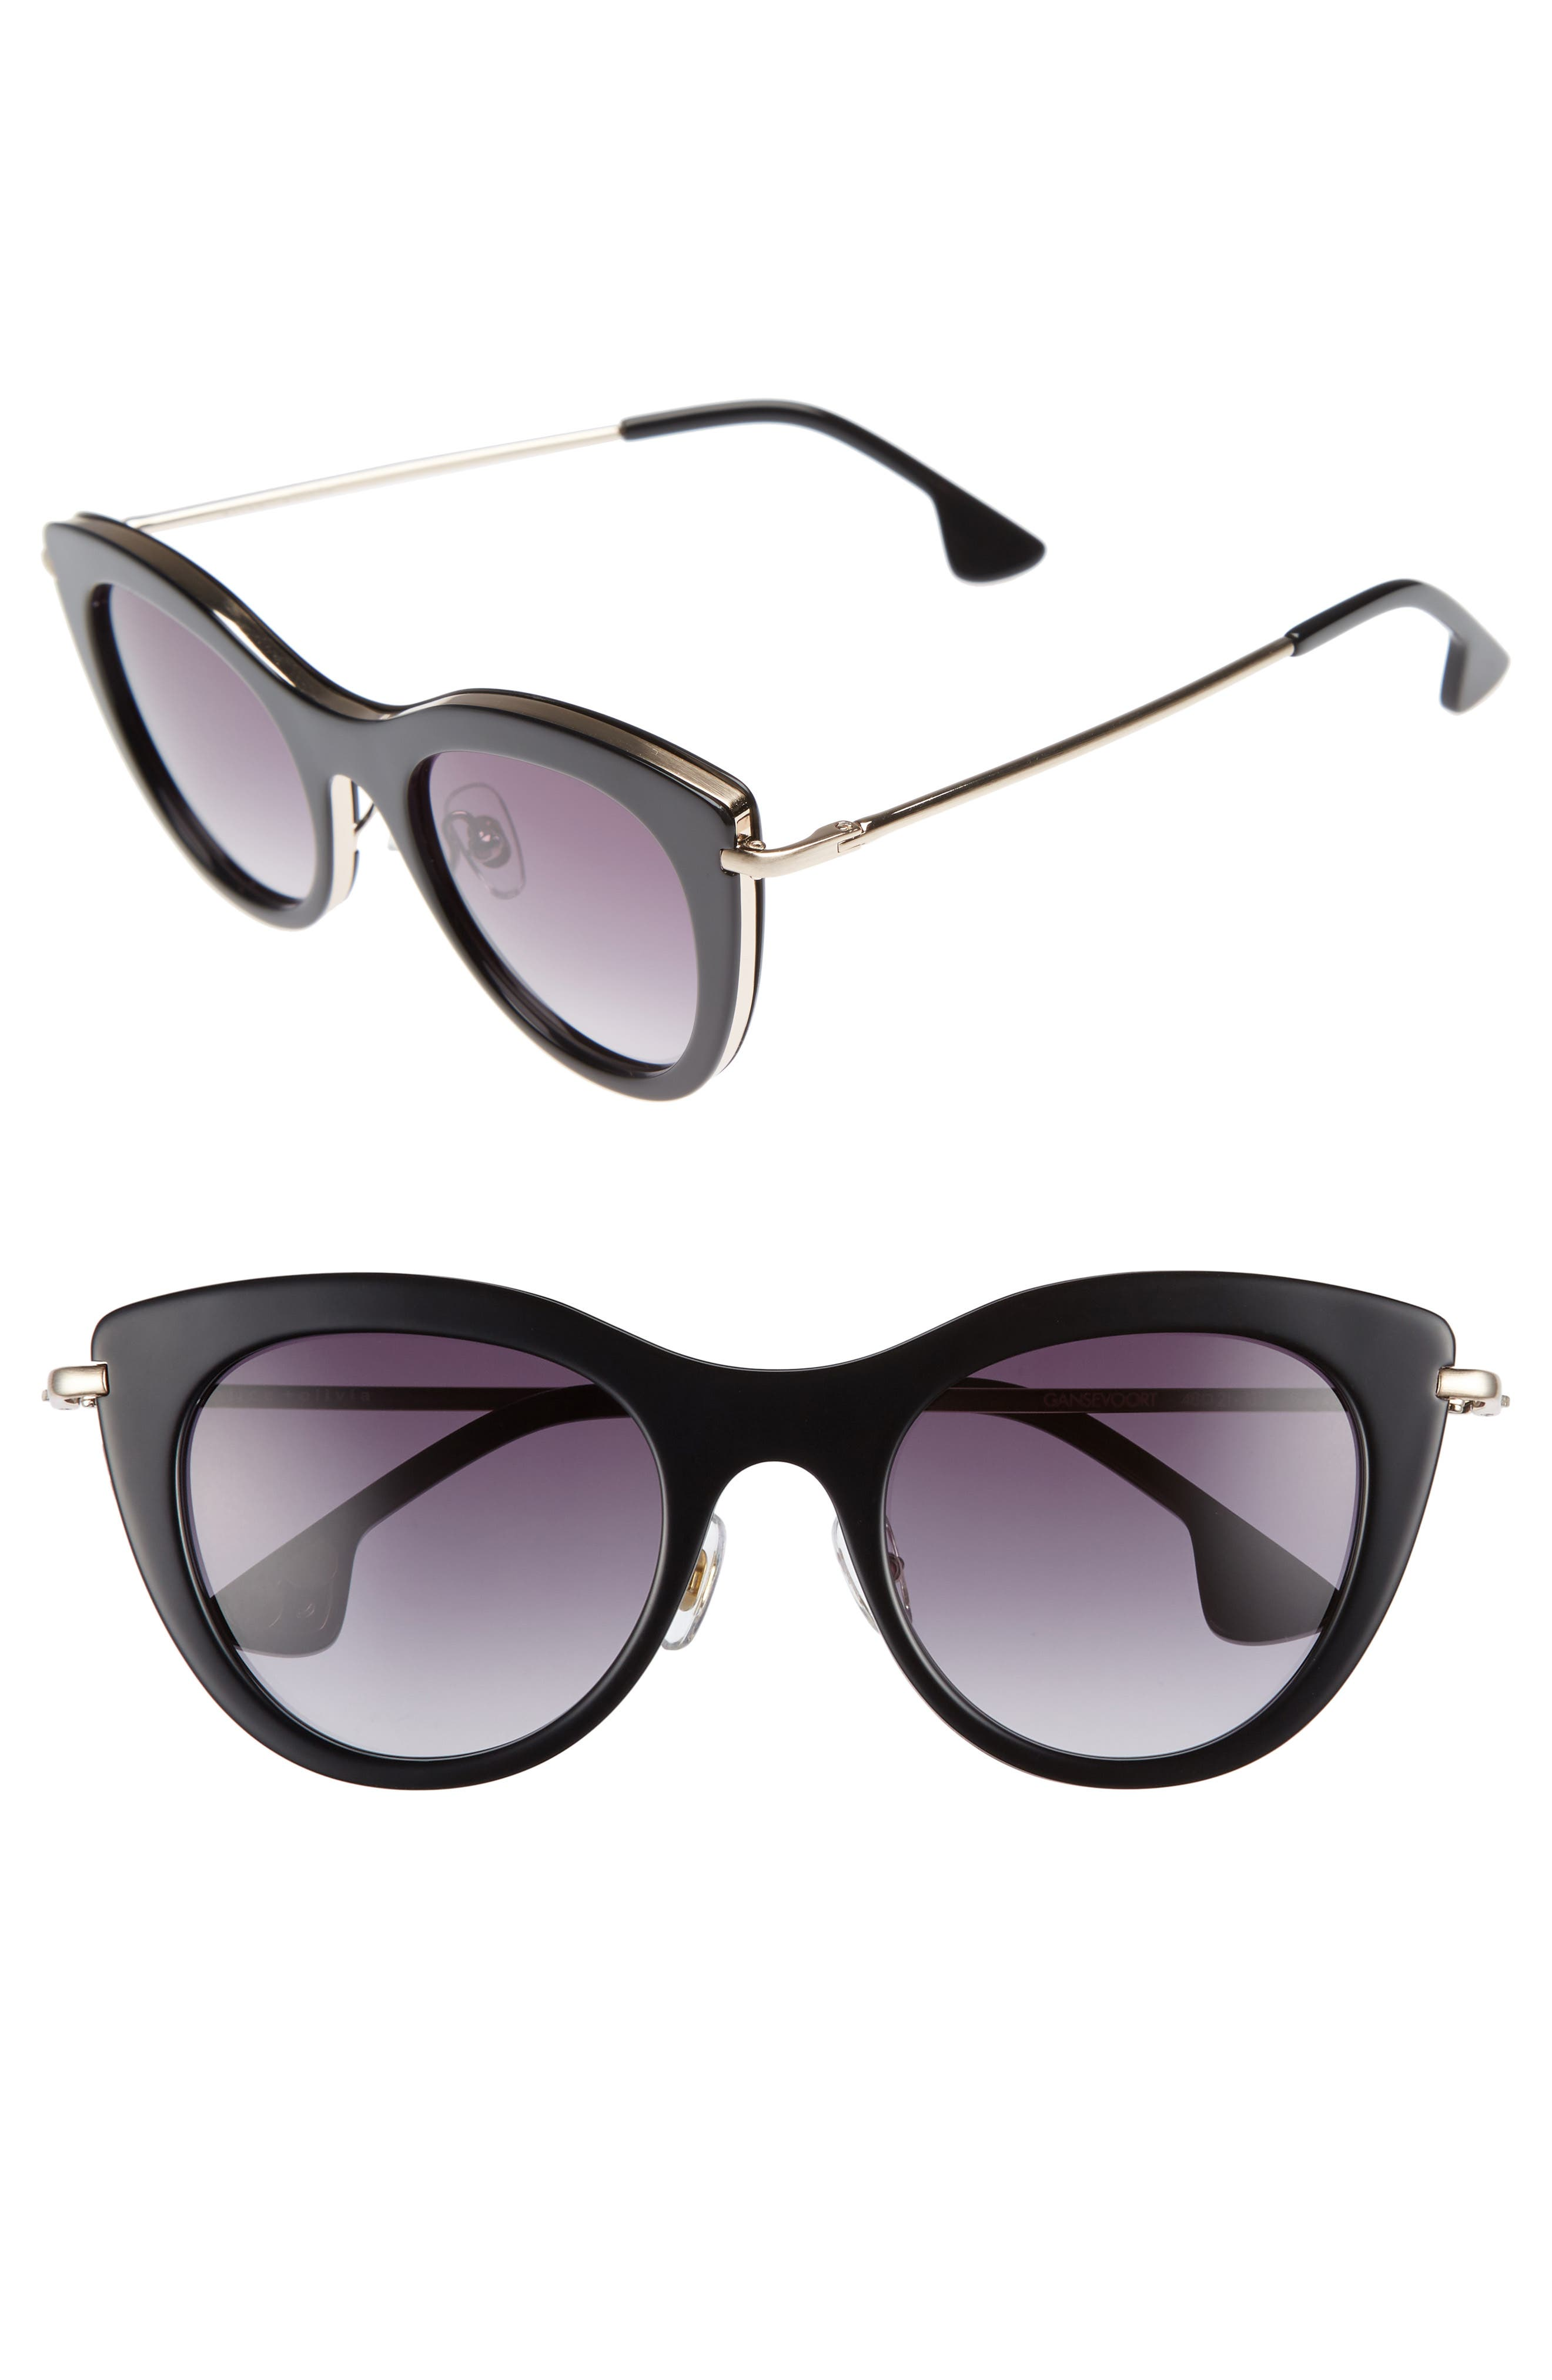 Main Image - Alice + Olivia Gansevoort 48mm Special Fit Cat Eye Sunglasses